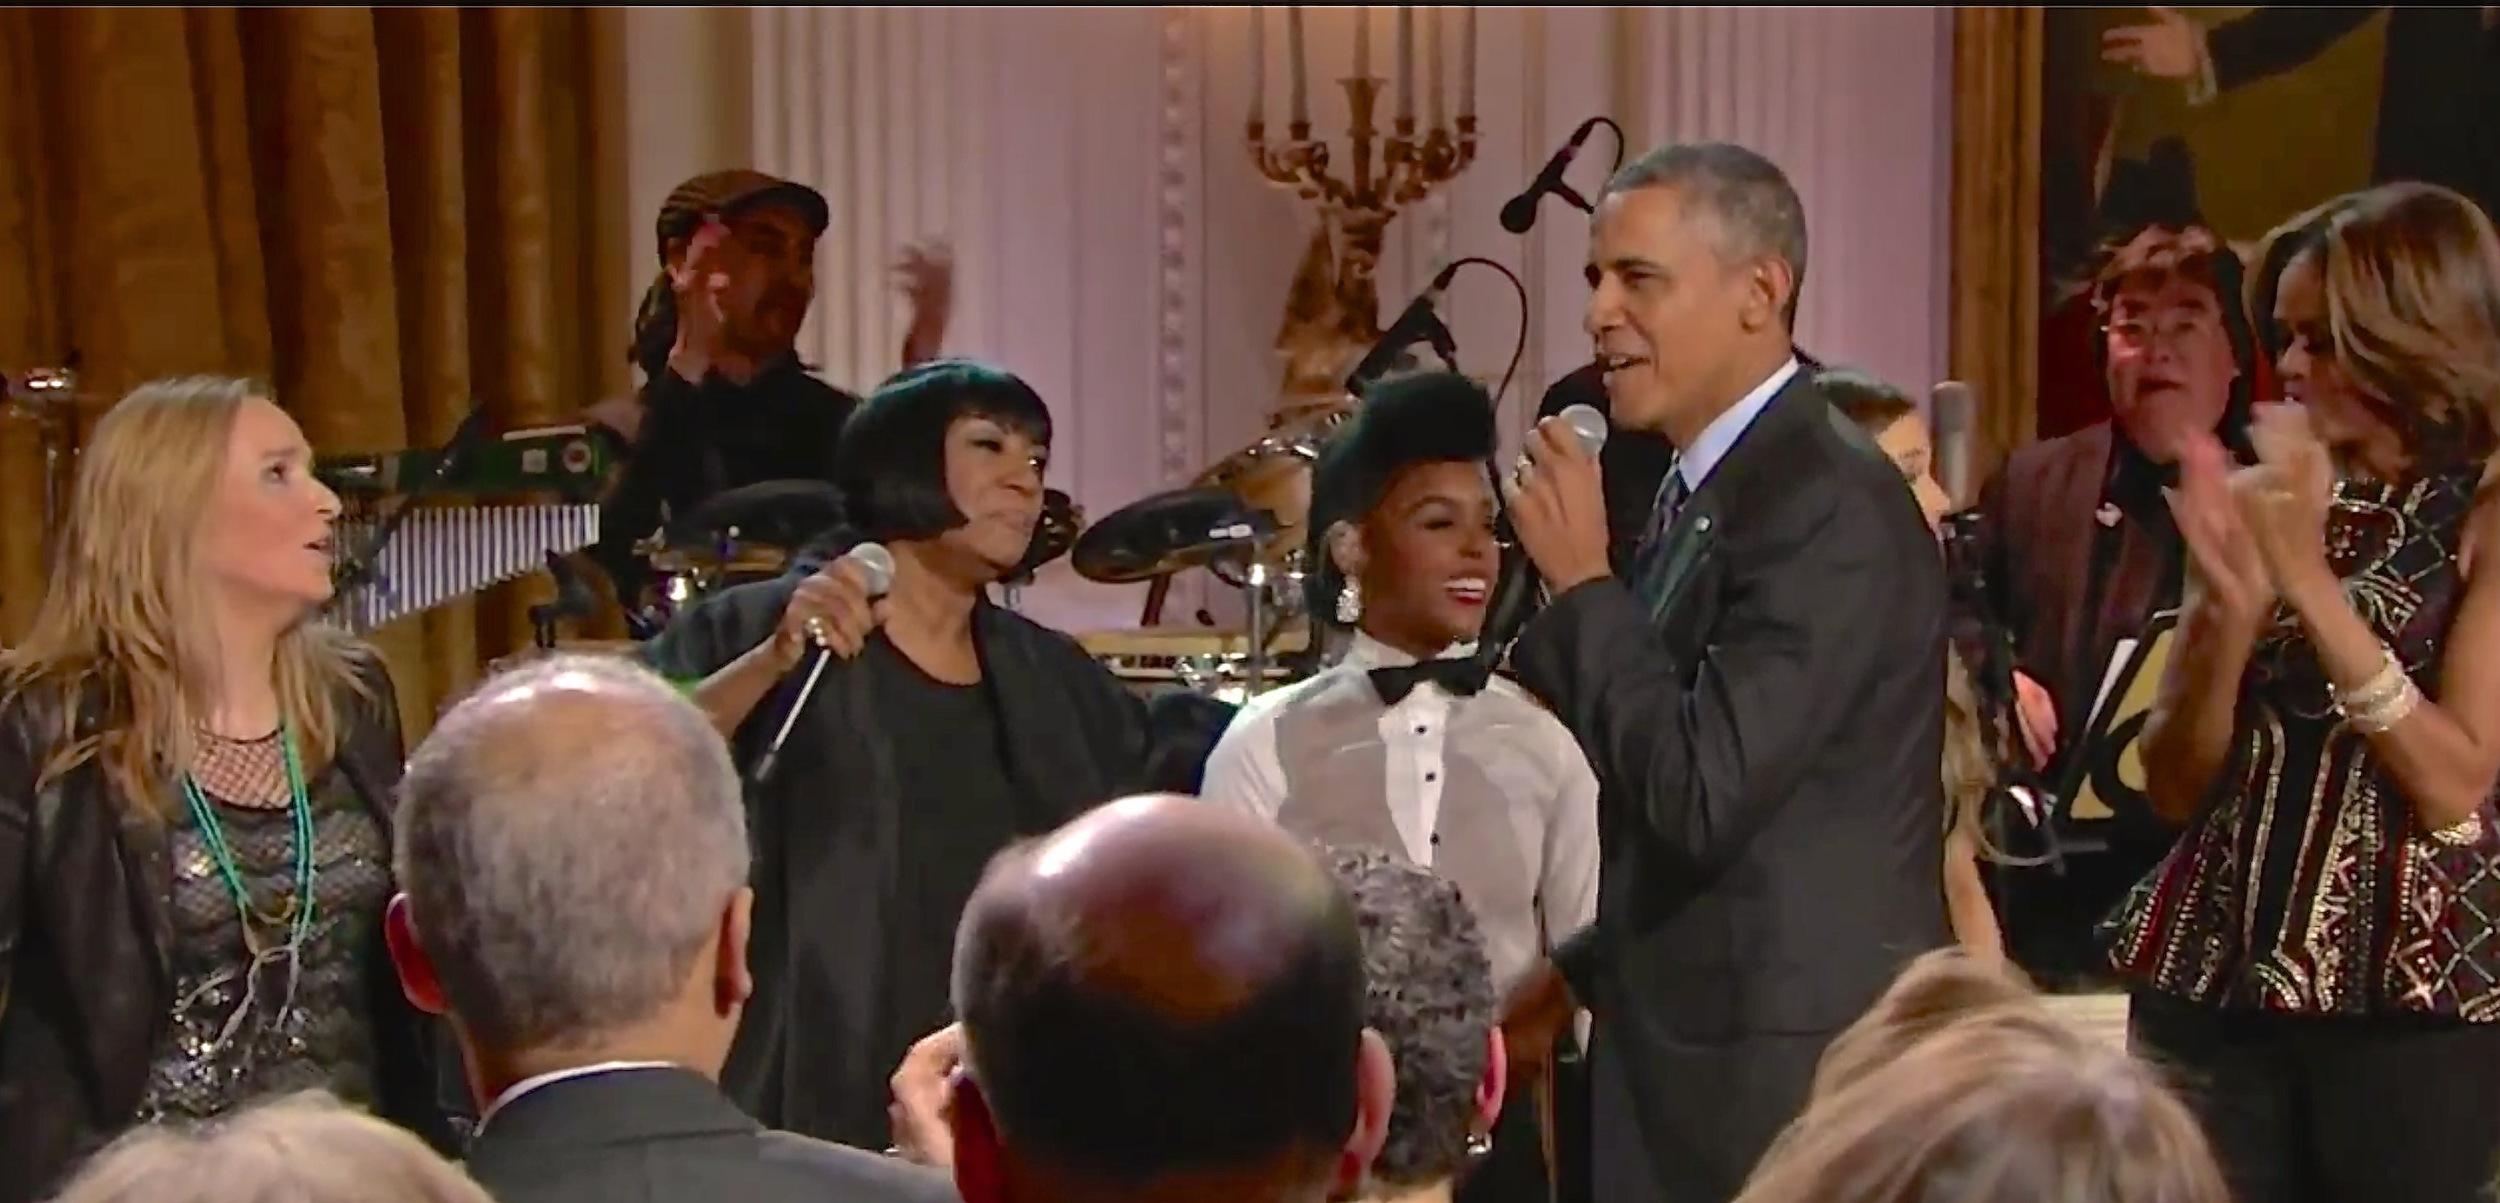 Melissa Etheridge, Patti LaBelle, Janelle Monáe, President Barack Obama and First Lady Michelle Obama